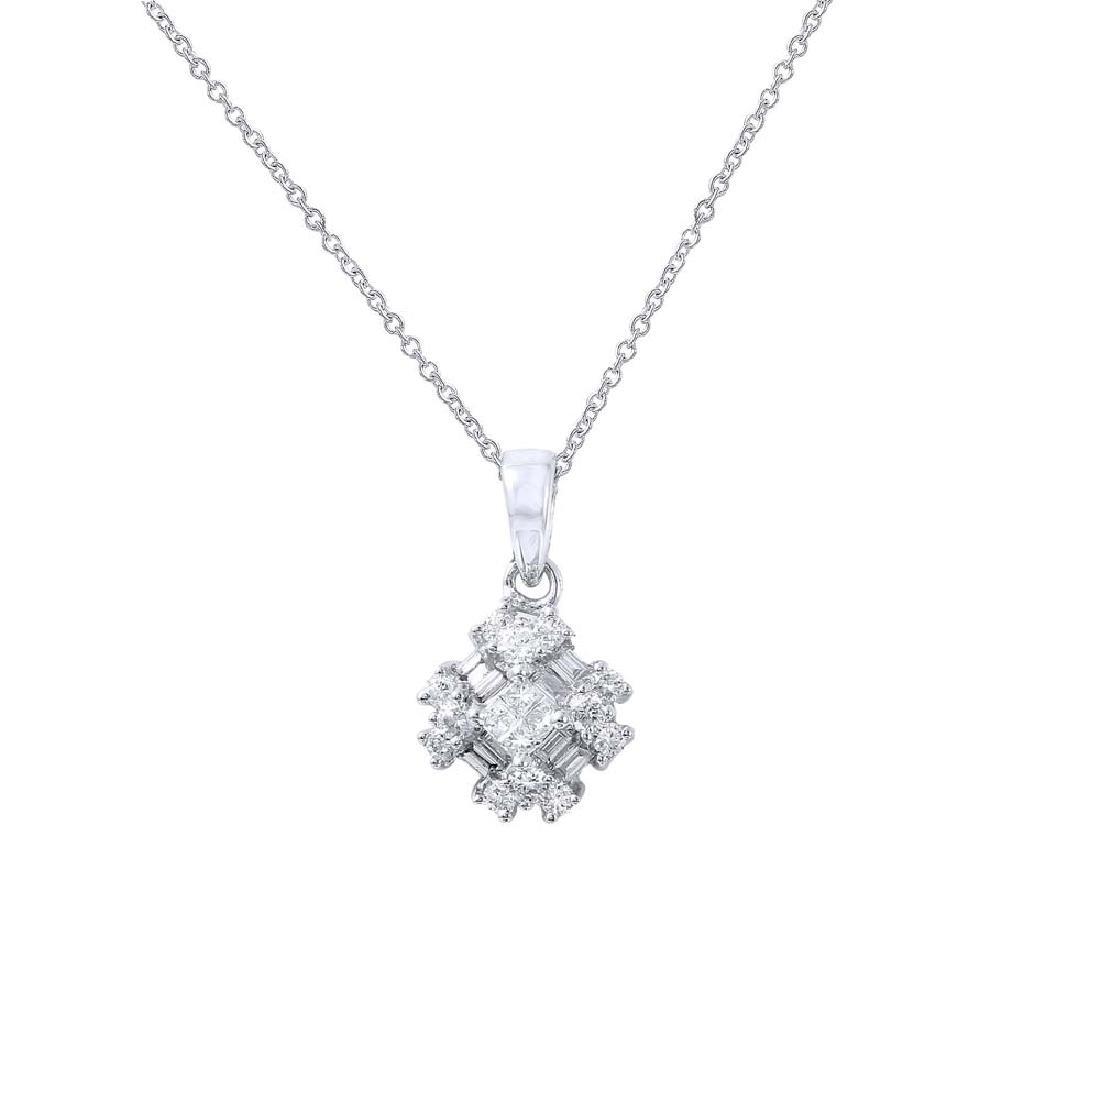 Genuine 0.44 TCW 18K White Gold Ladies Necklace